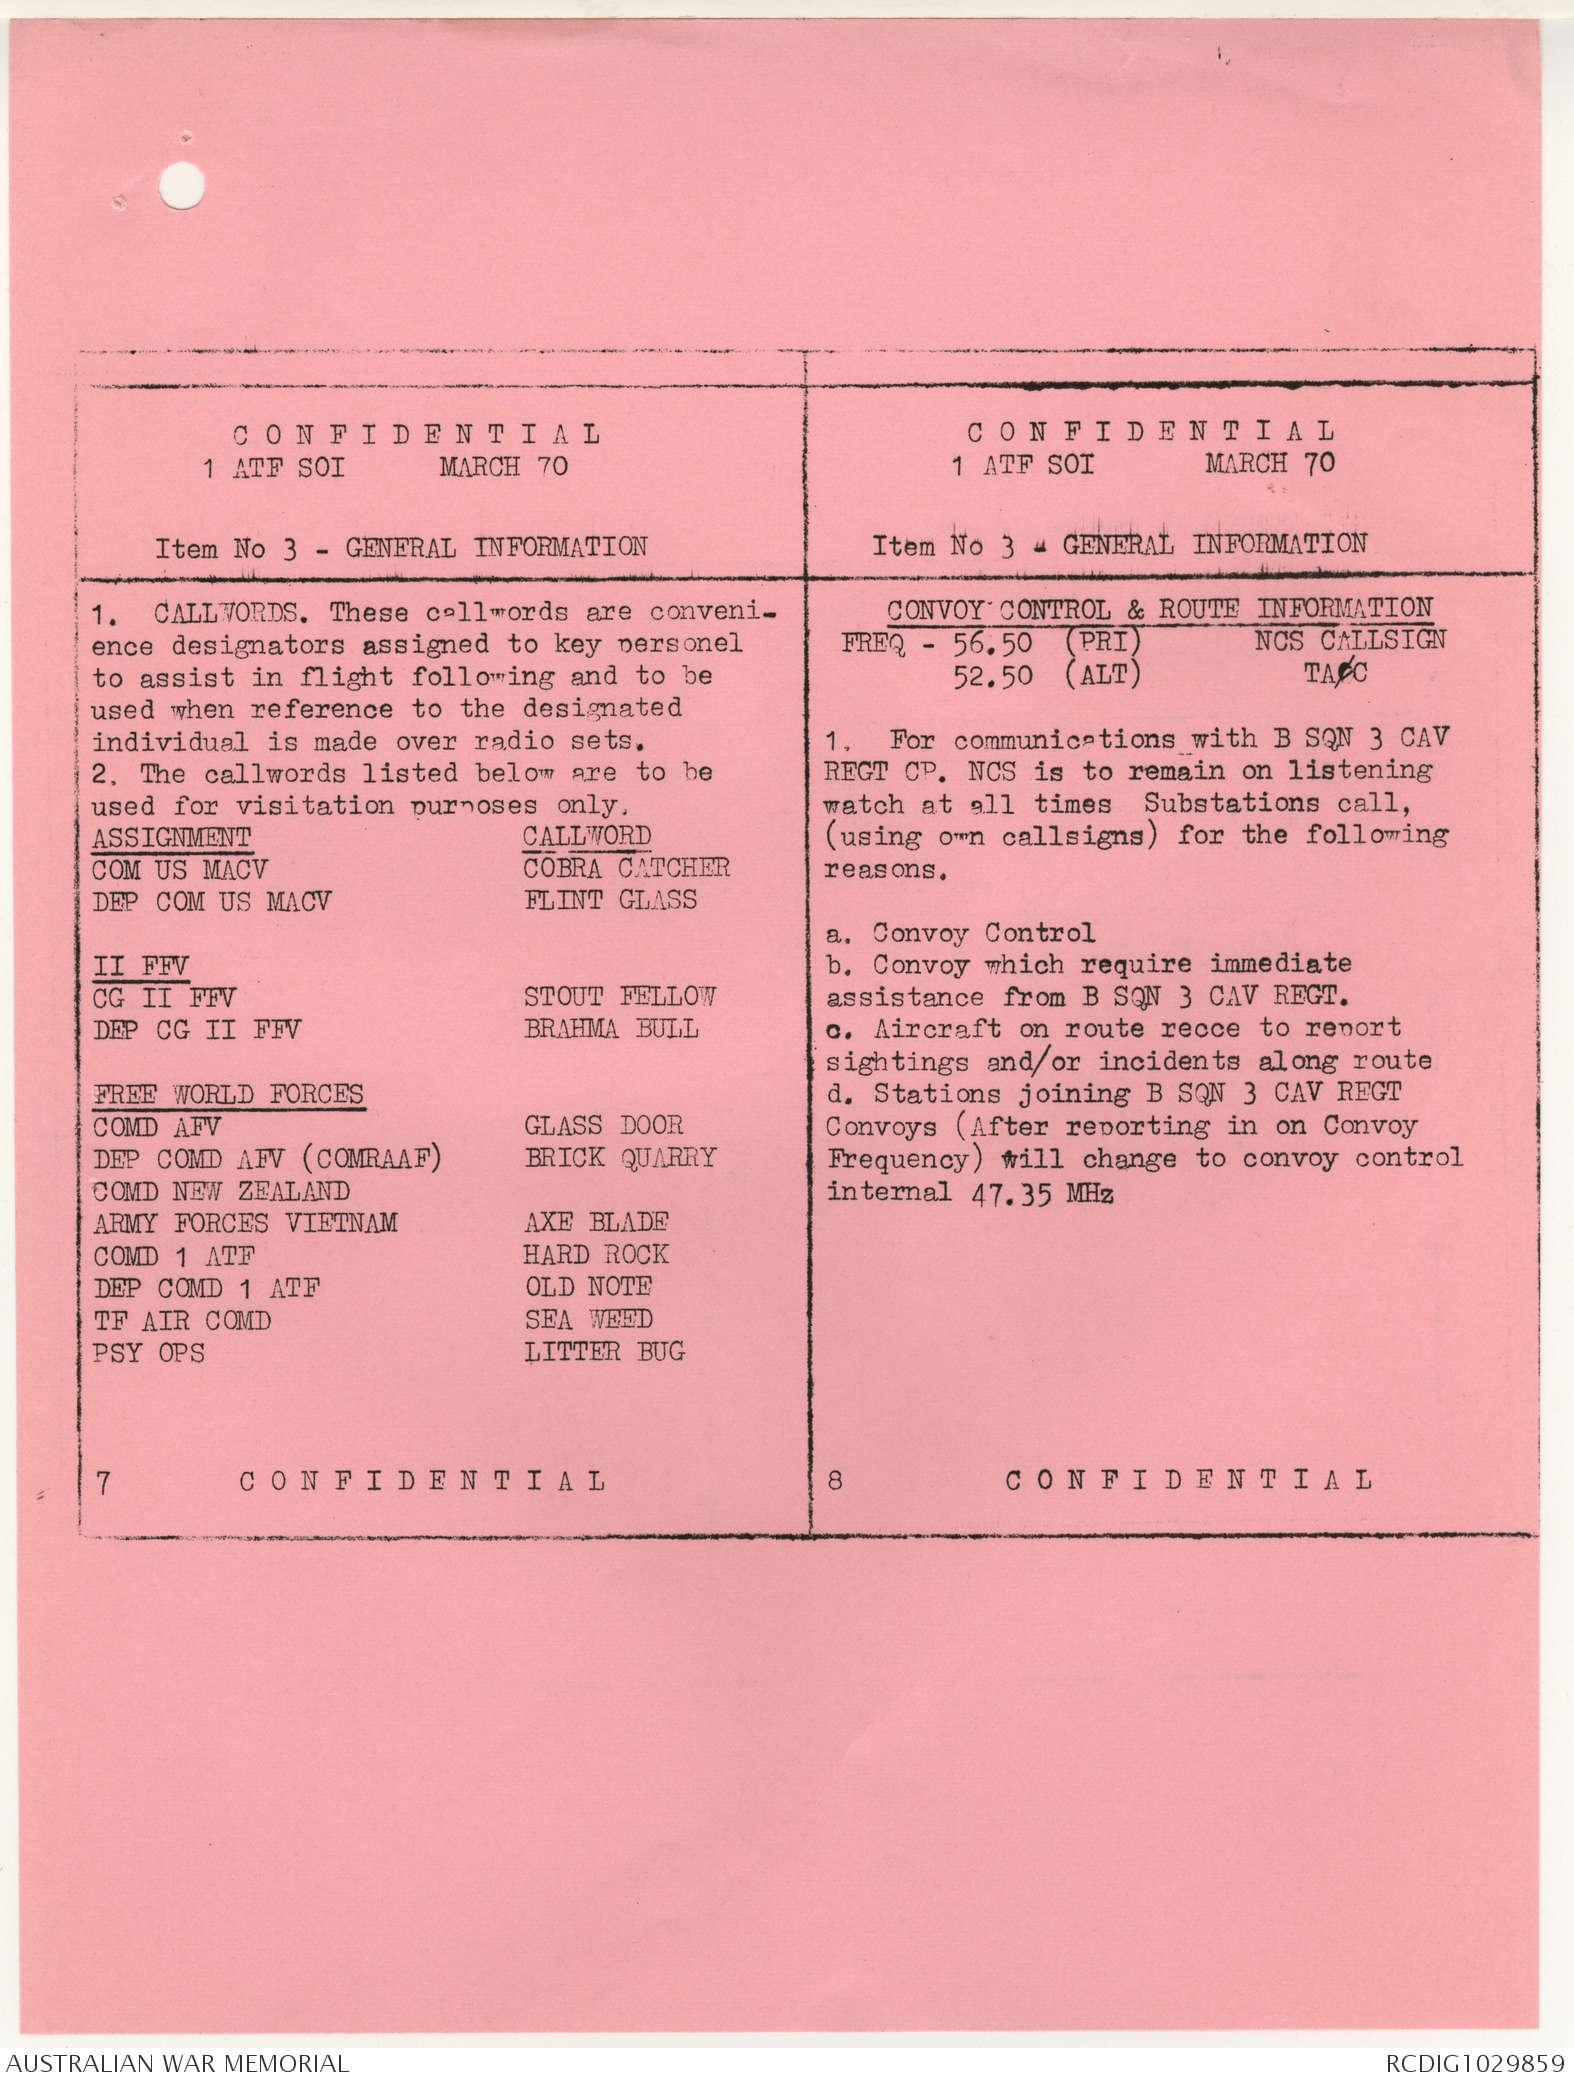 AWM95 6/2/35 - 1-28 February 1970, Narrative, Annexes | The